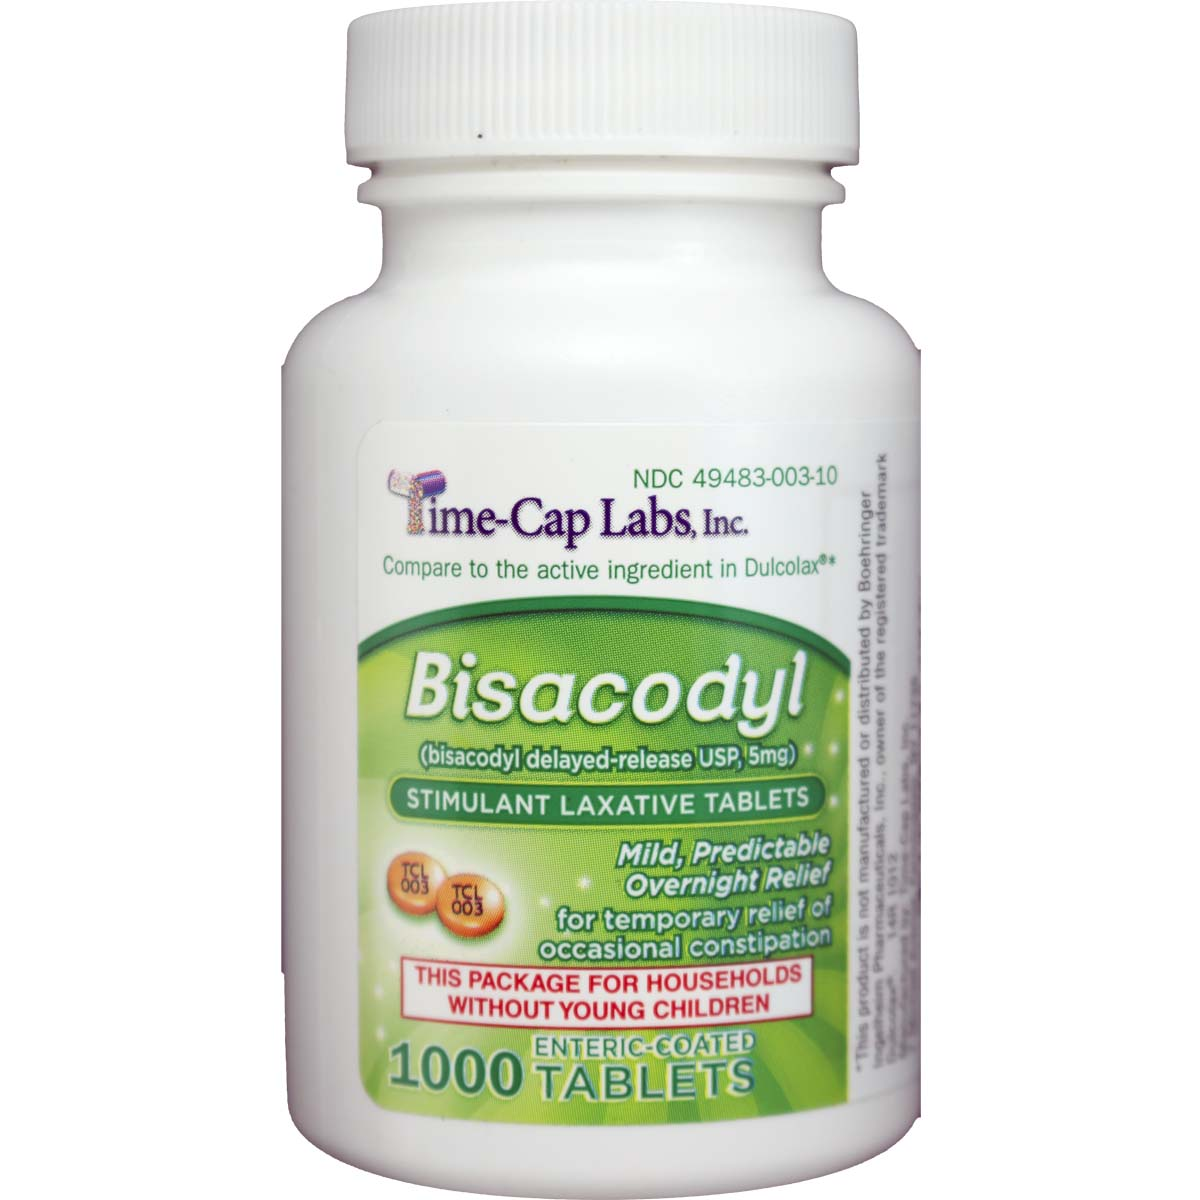 WonderLabs - Vitamins, Minerals And